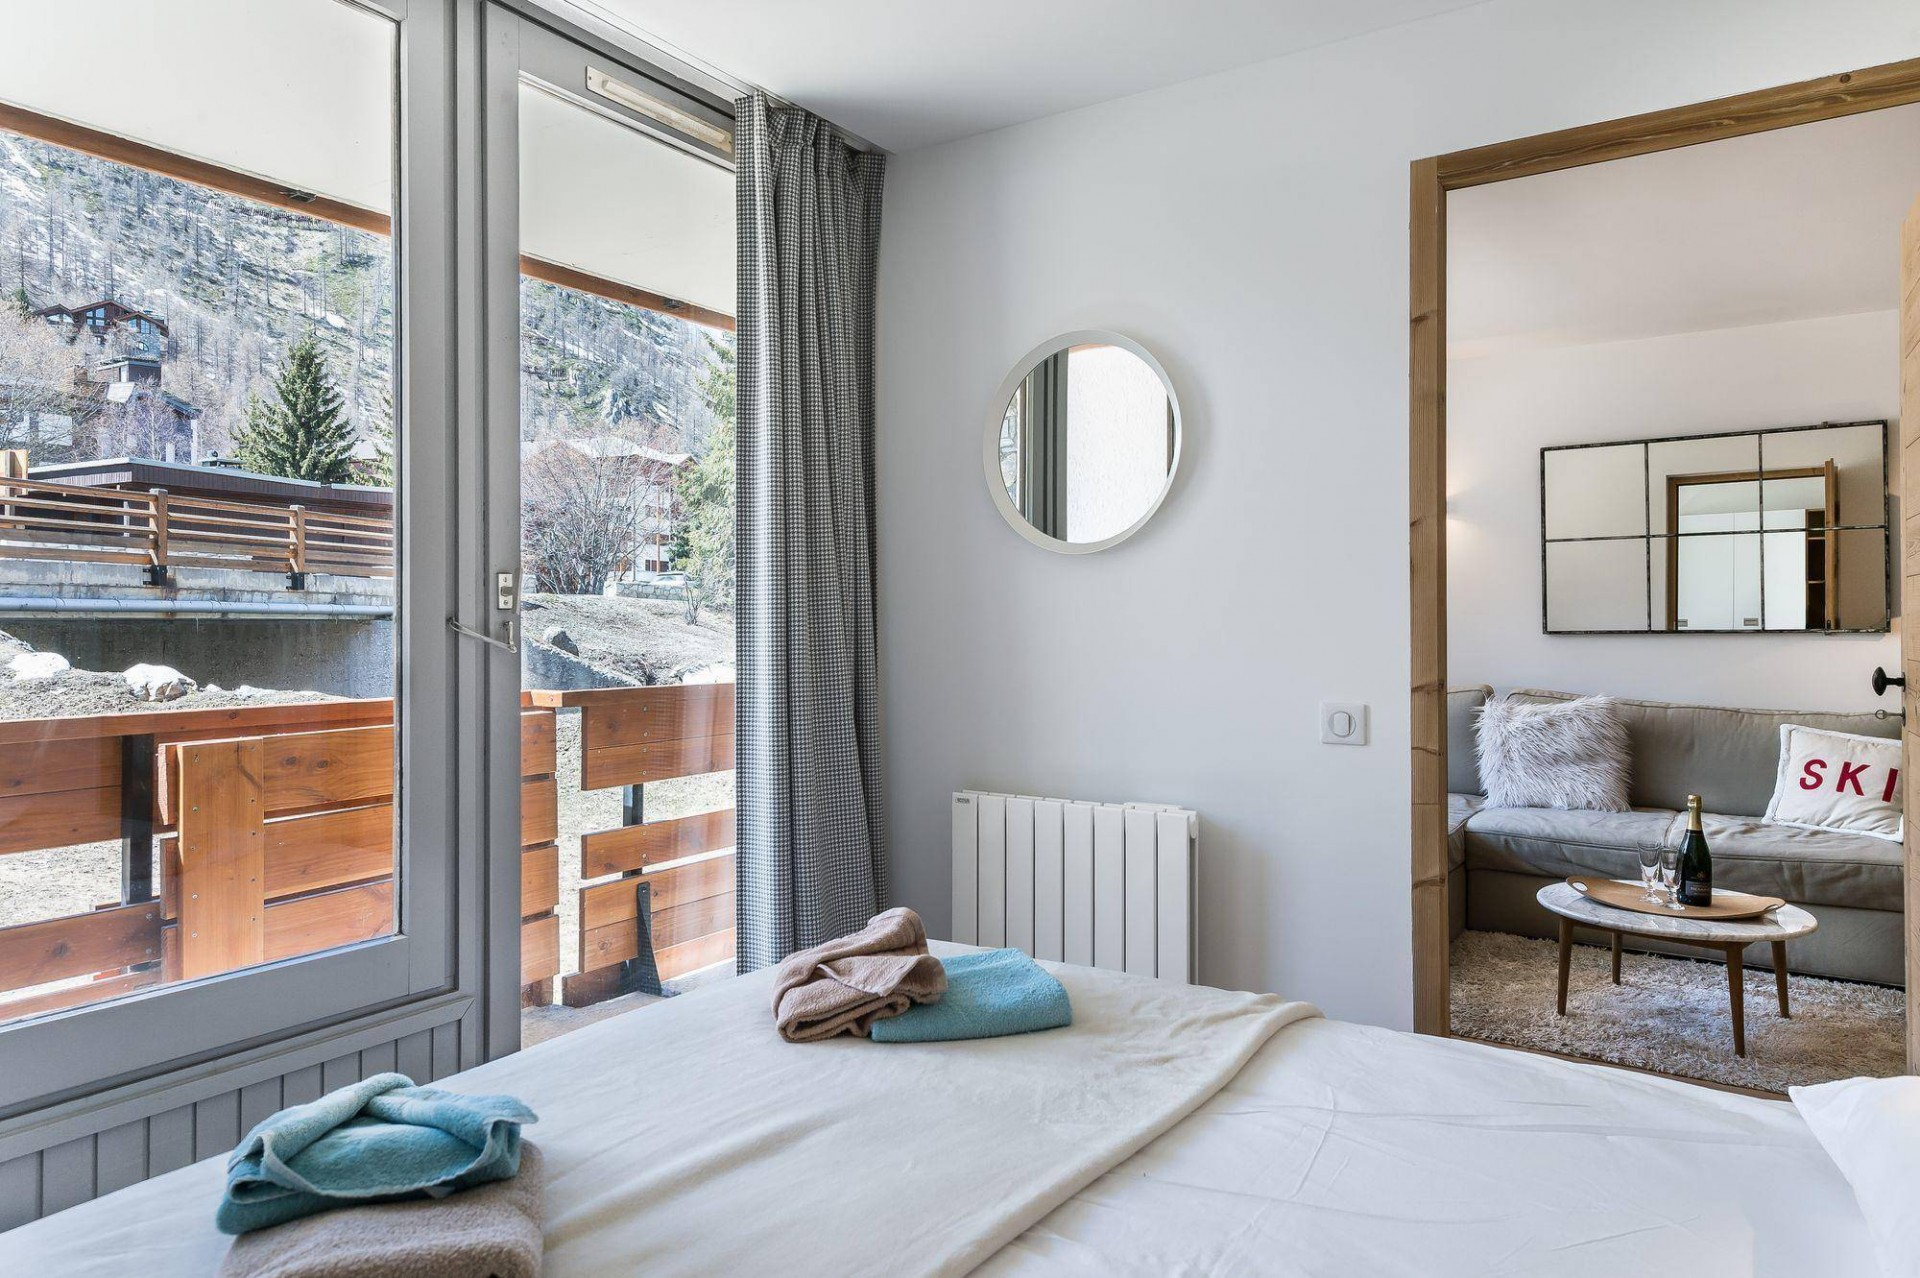 Val d'Isère Luxury Rental Appartment Eclaite Bedroom